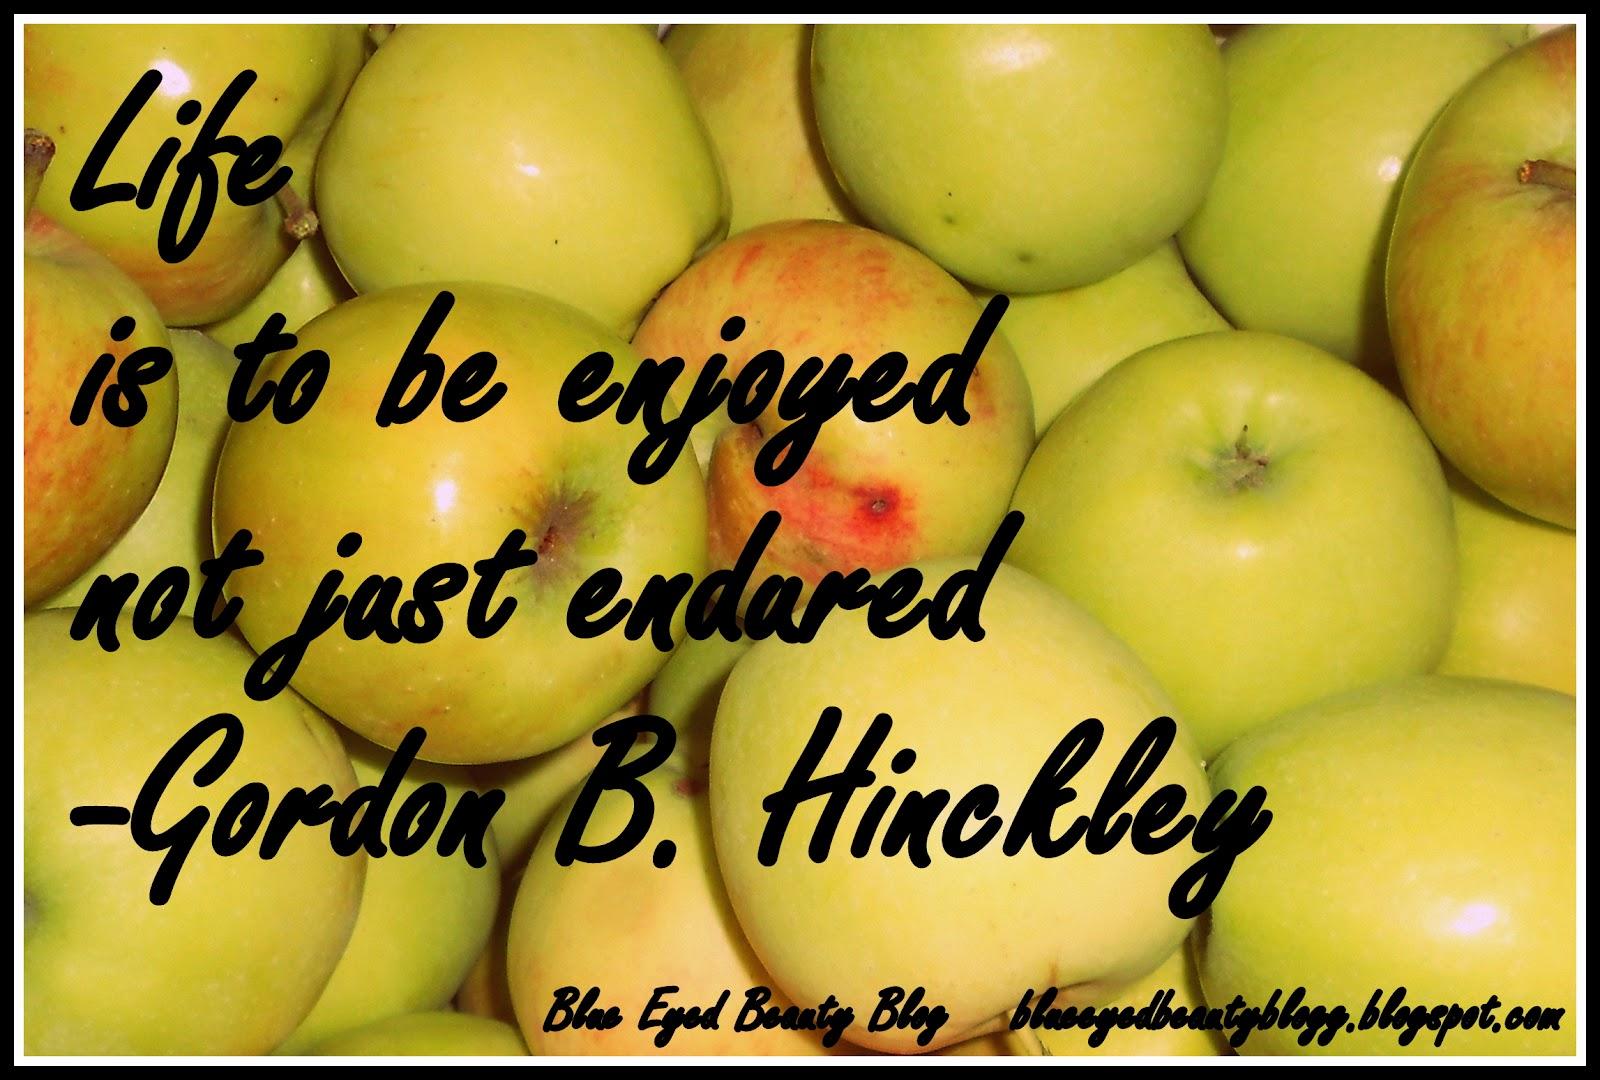 Gordon B Hinckley Quotes Blue Eyed Beauty Blog Quote  Gordon Bhinckley